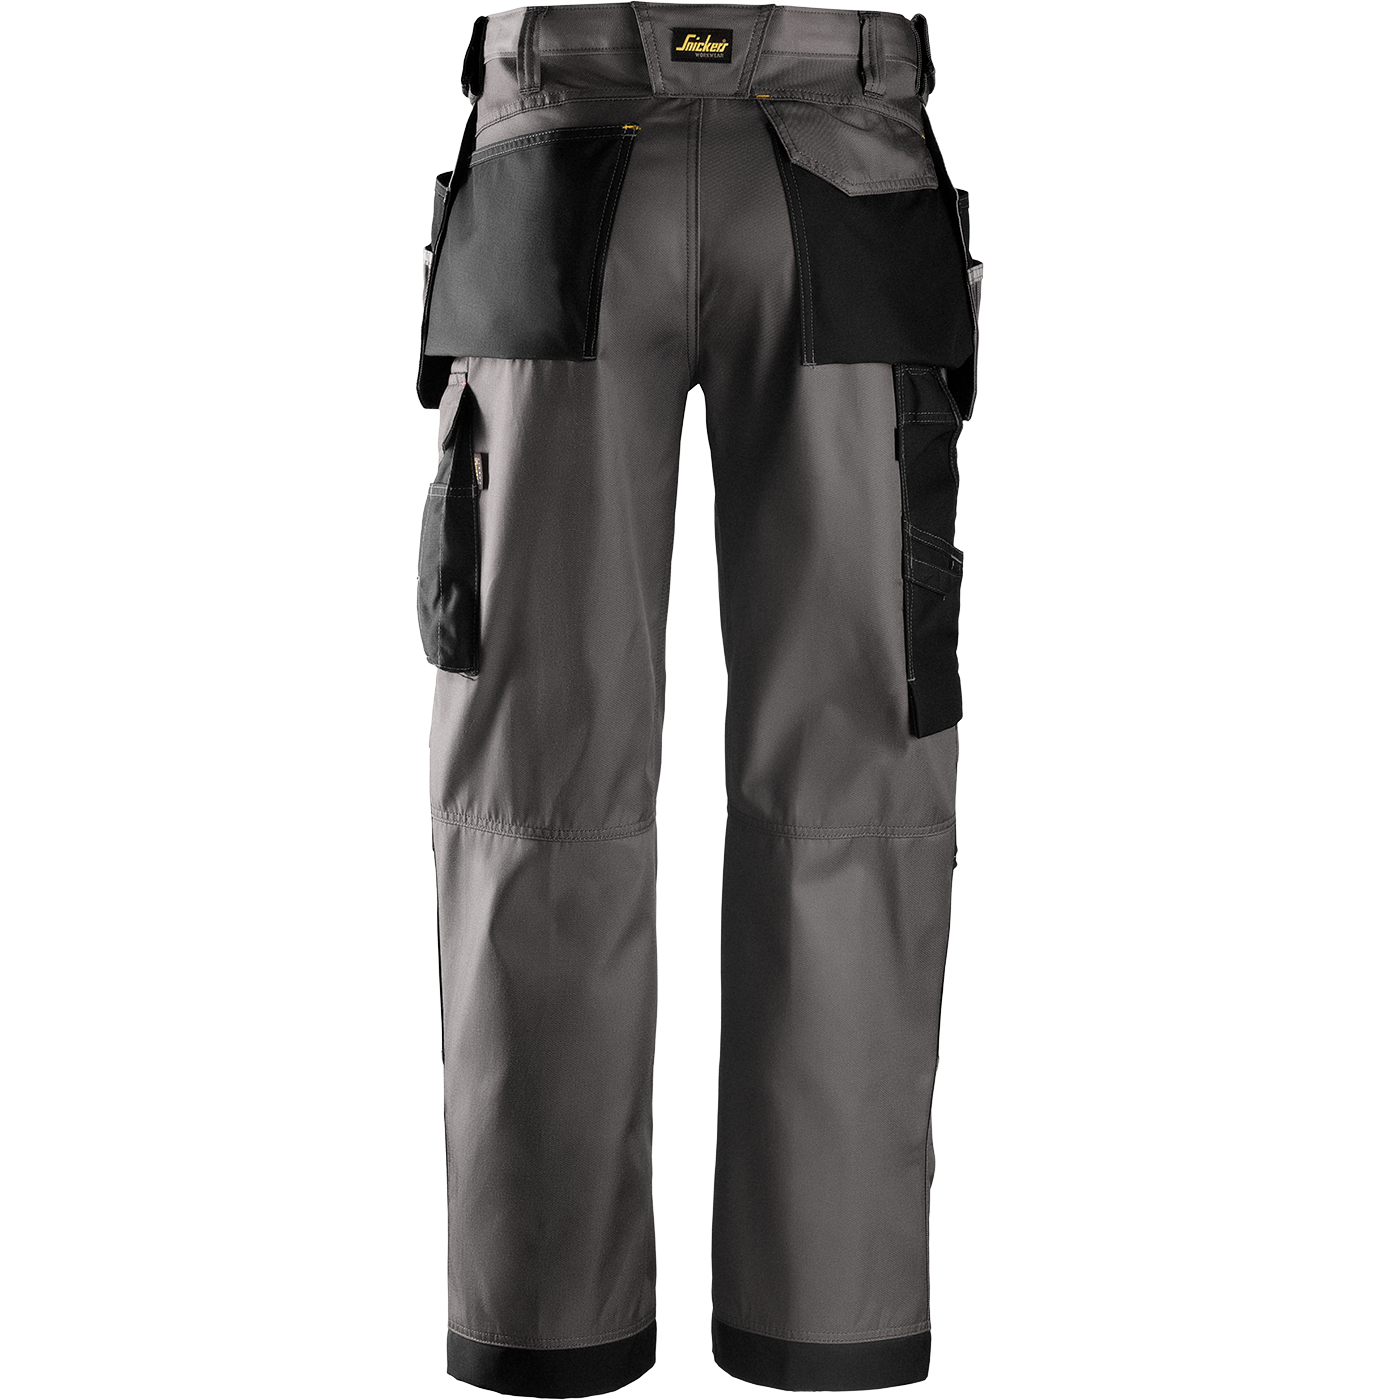 SNICKERS Workwear põlvekaitsmed